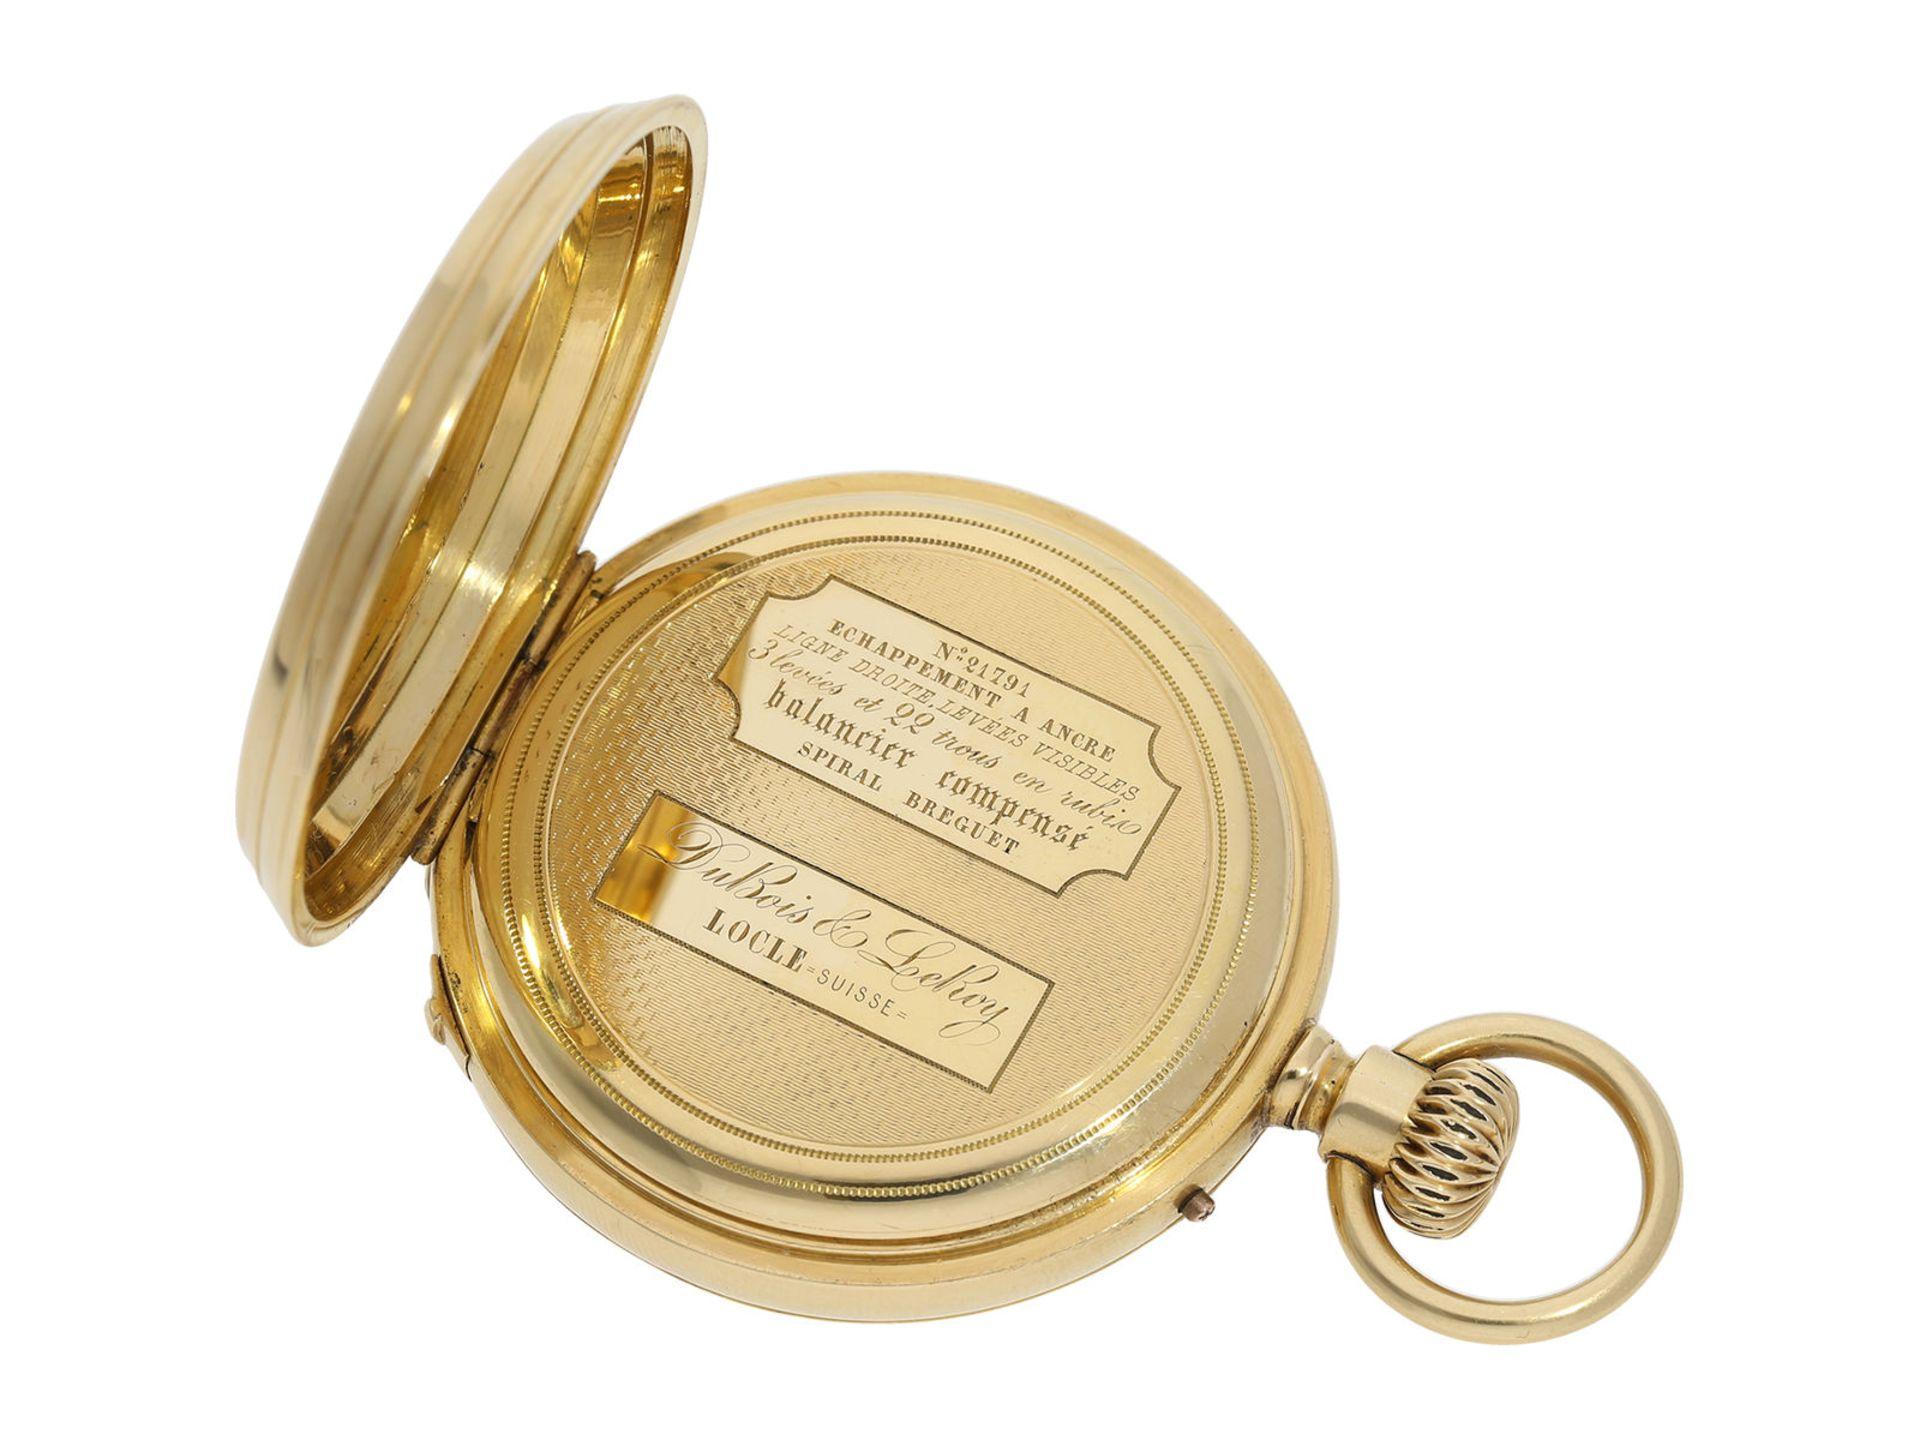 Pocket watch: early precision pocket watch with Seconde Morte, very fine quality, DuBois & LeRoy No. - Bild 4 aus 5